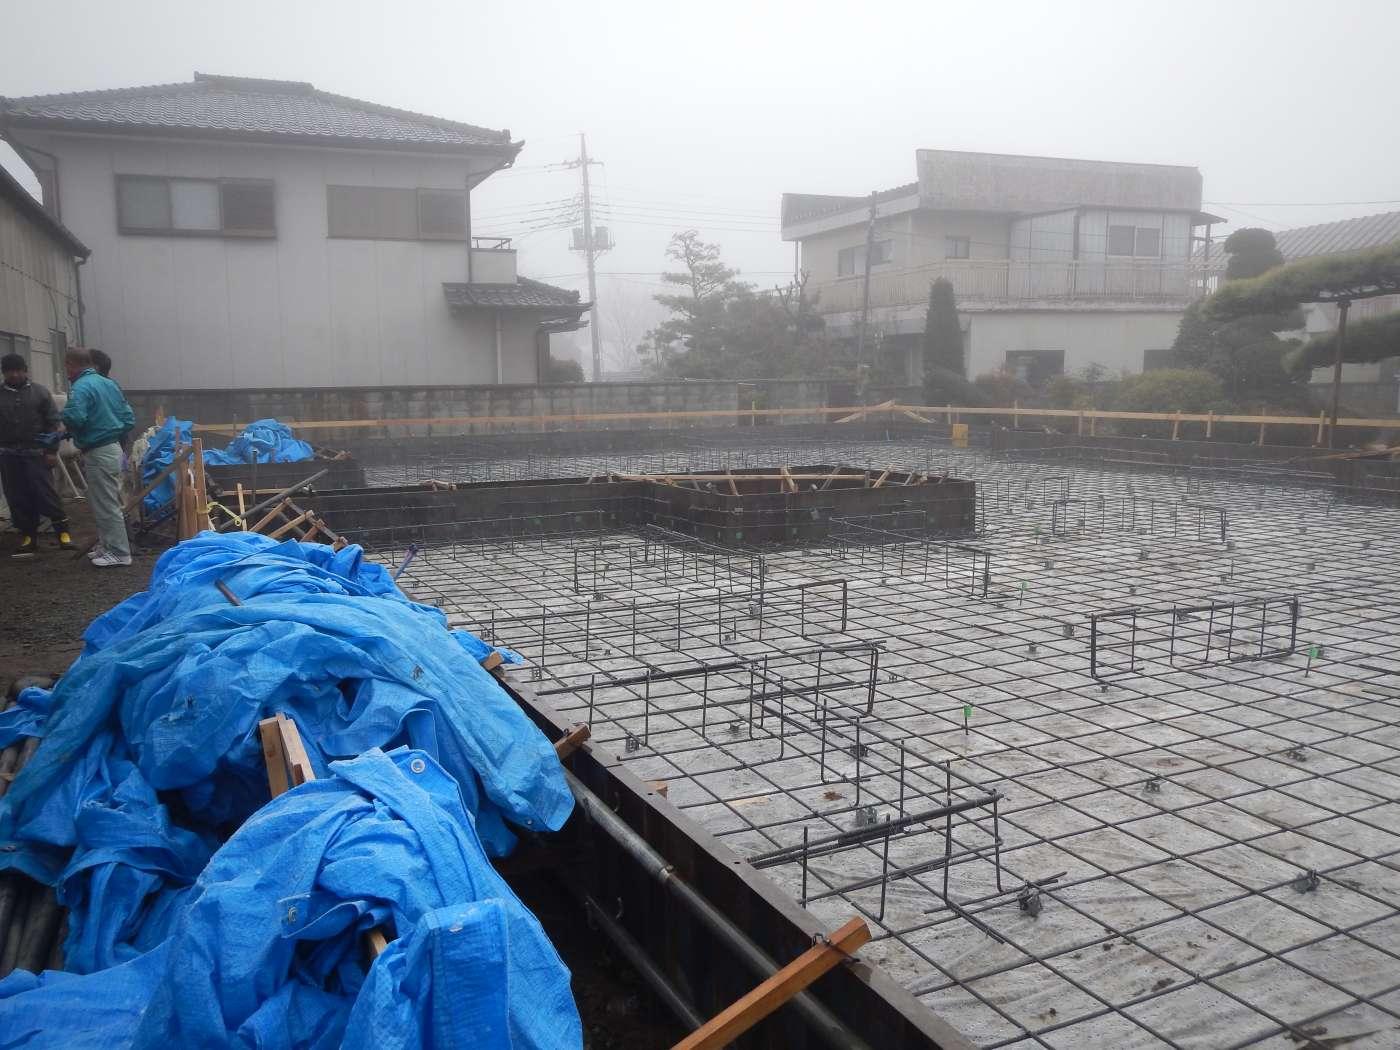 http://sumainomatsuki.com/folder1/DSCN2525.JPG